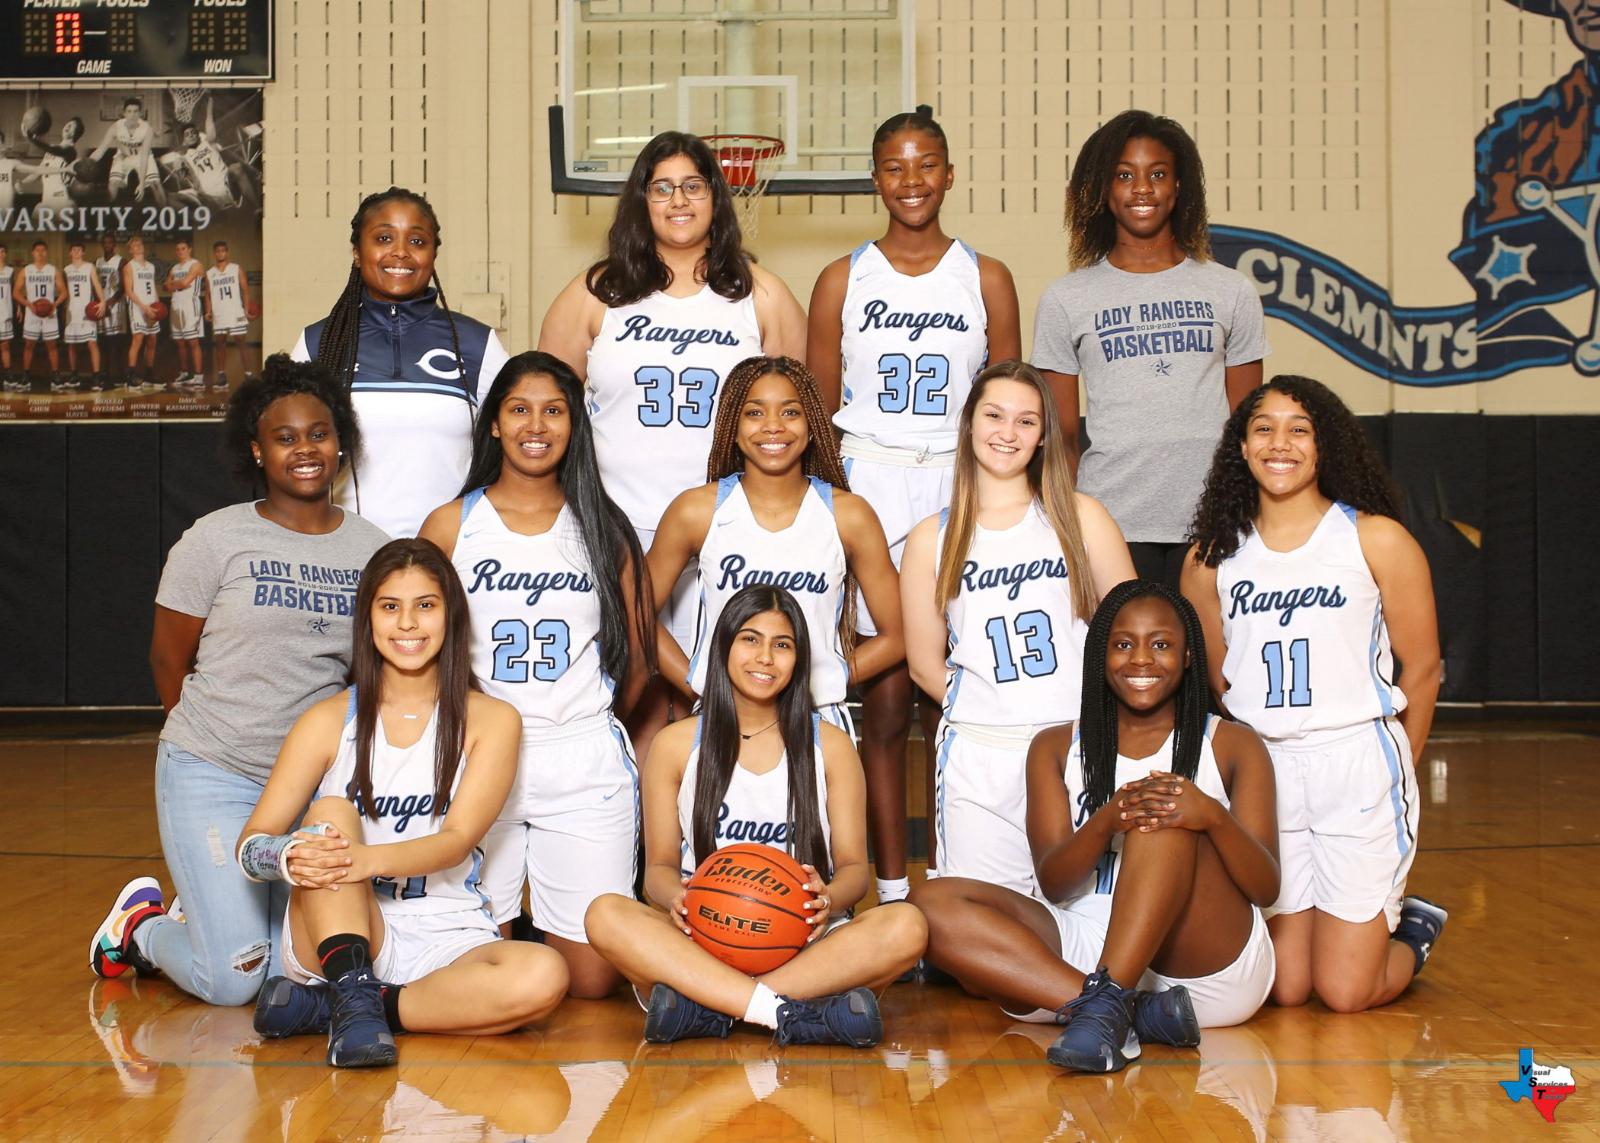 2019-2020 CHS Lady Rangers Basketball Team Photos & Schedules